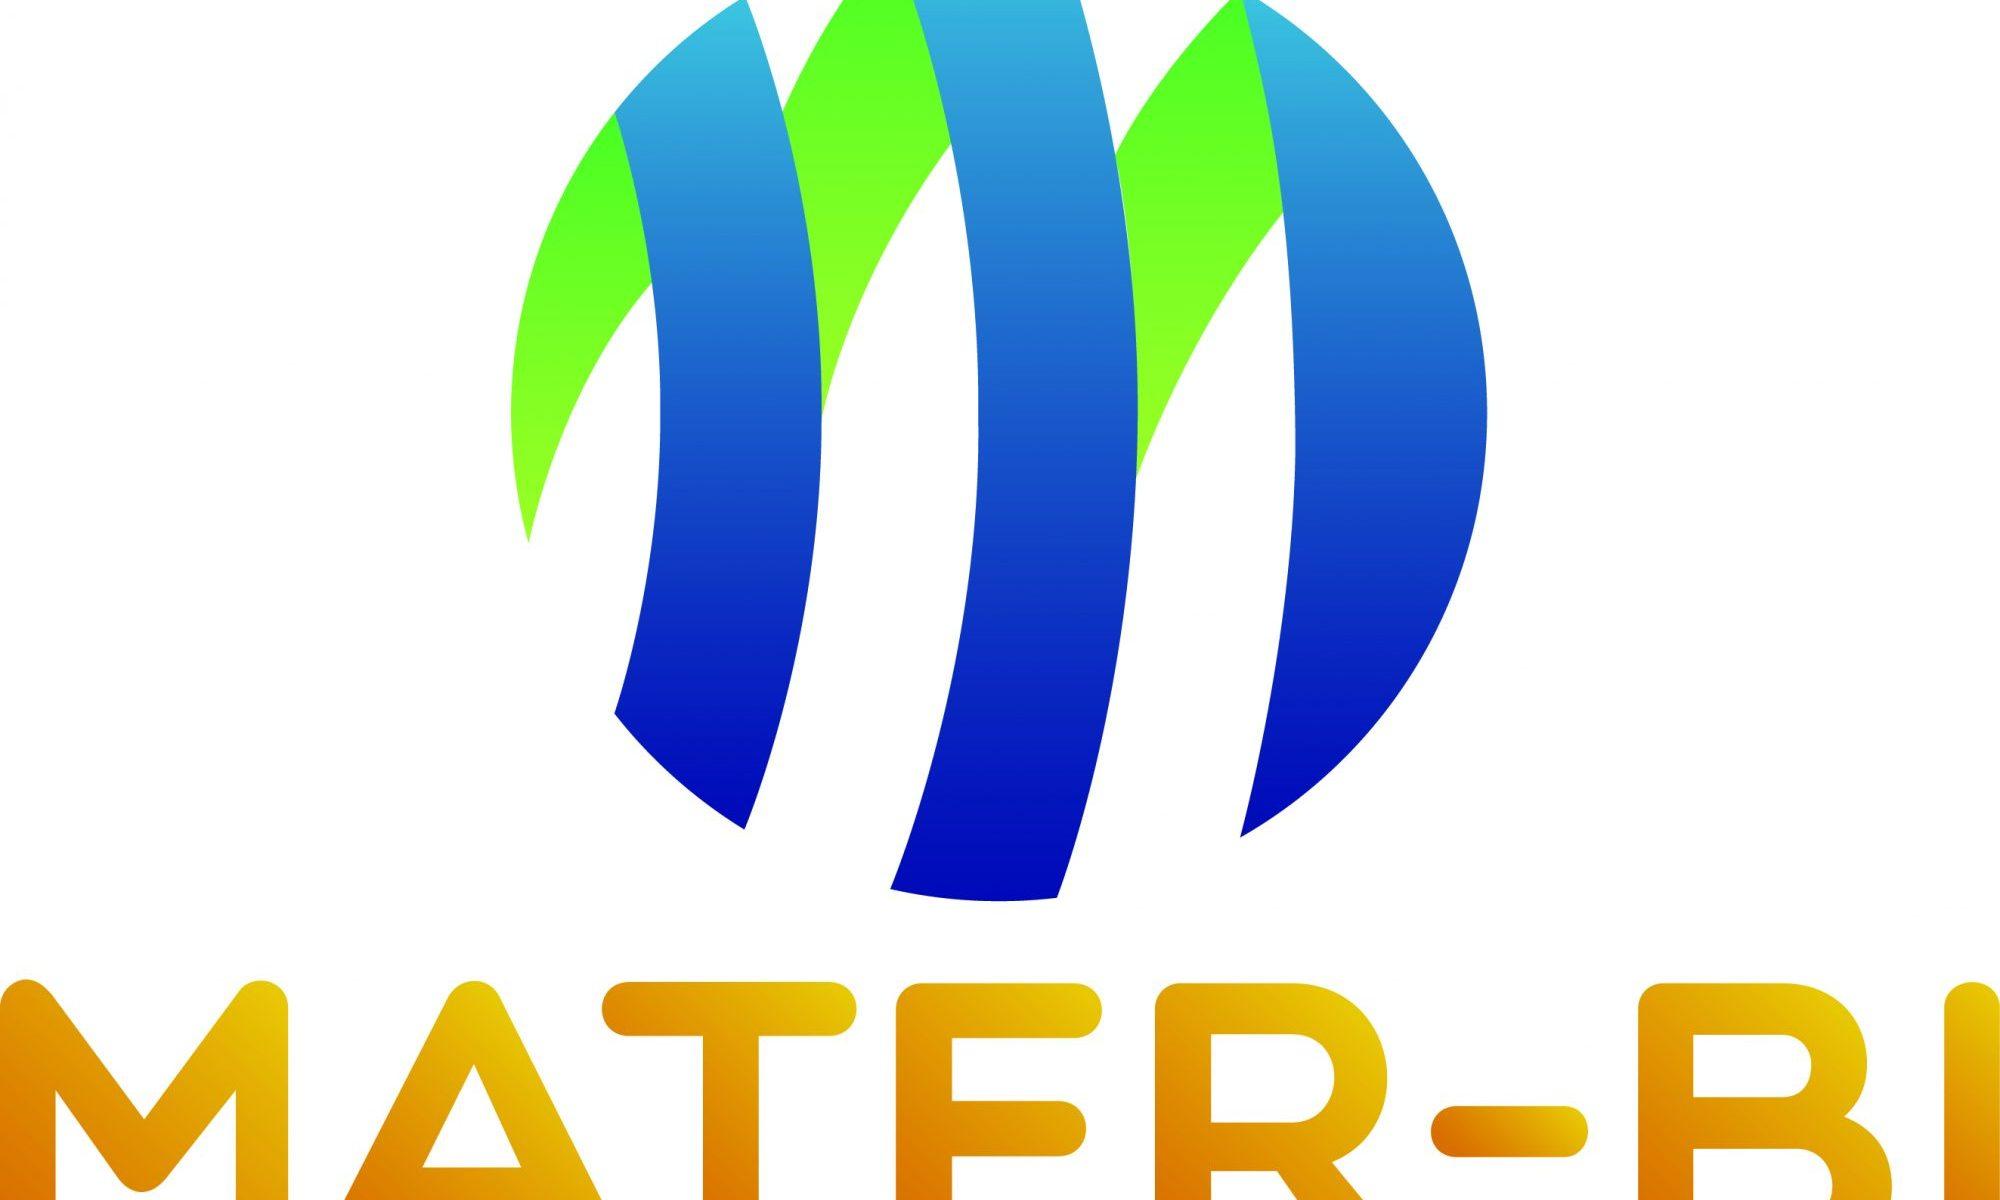 mater bi marine biodegradability